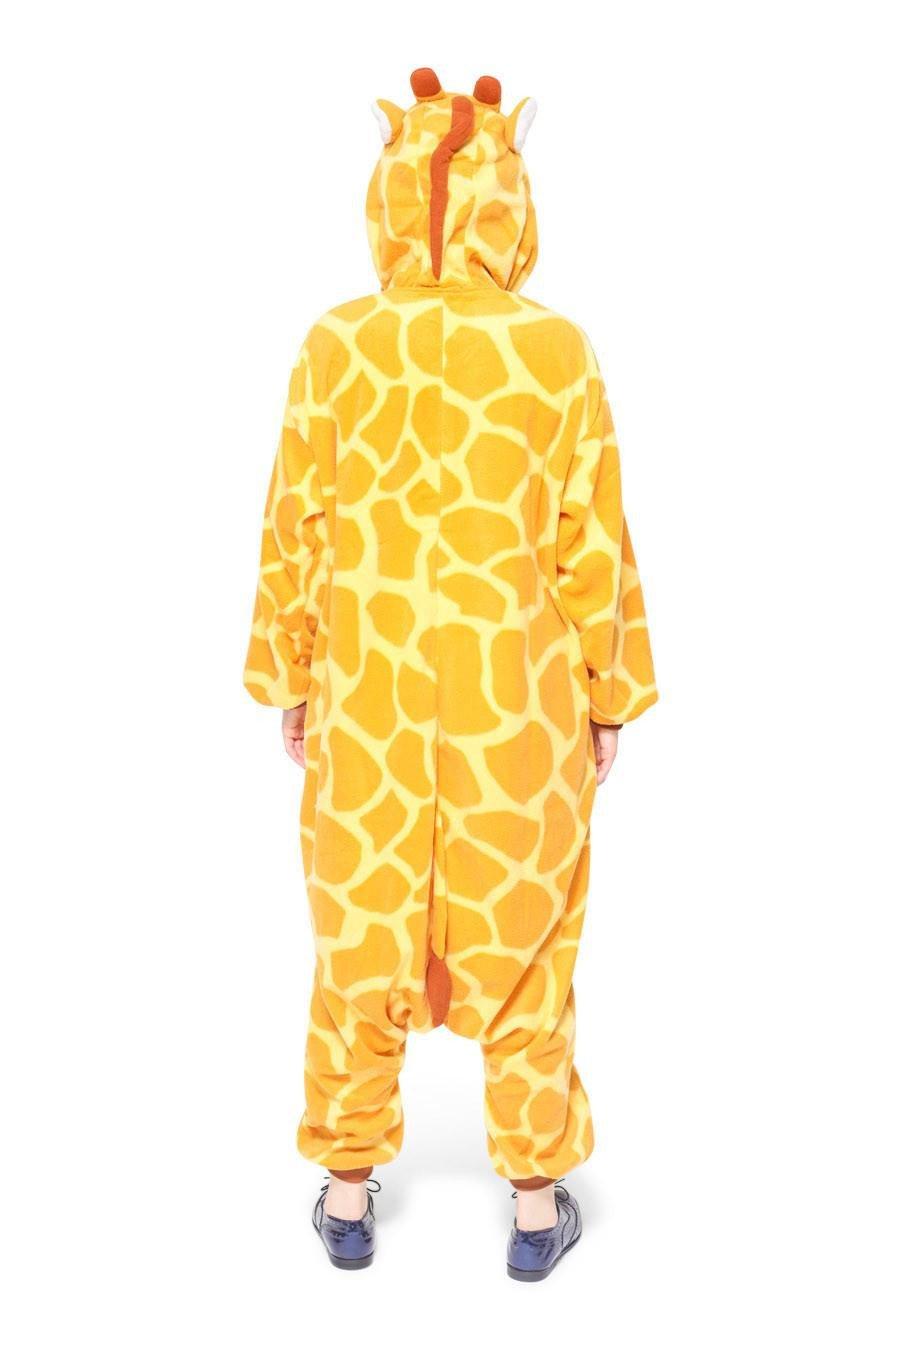 Купить Пижама кигуруми жираф в СПБ недорого